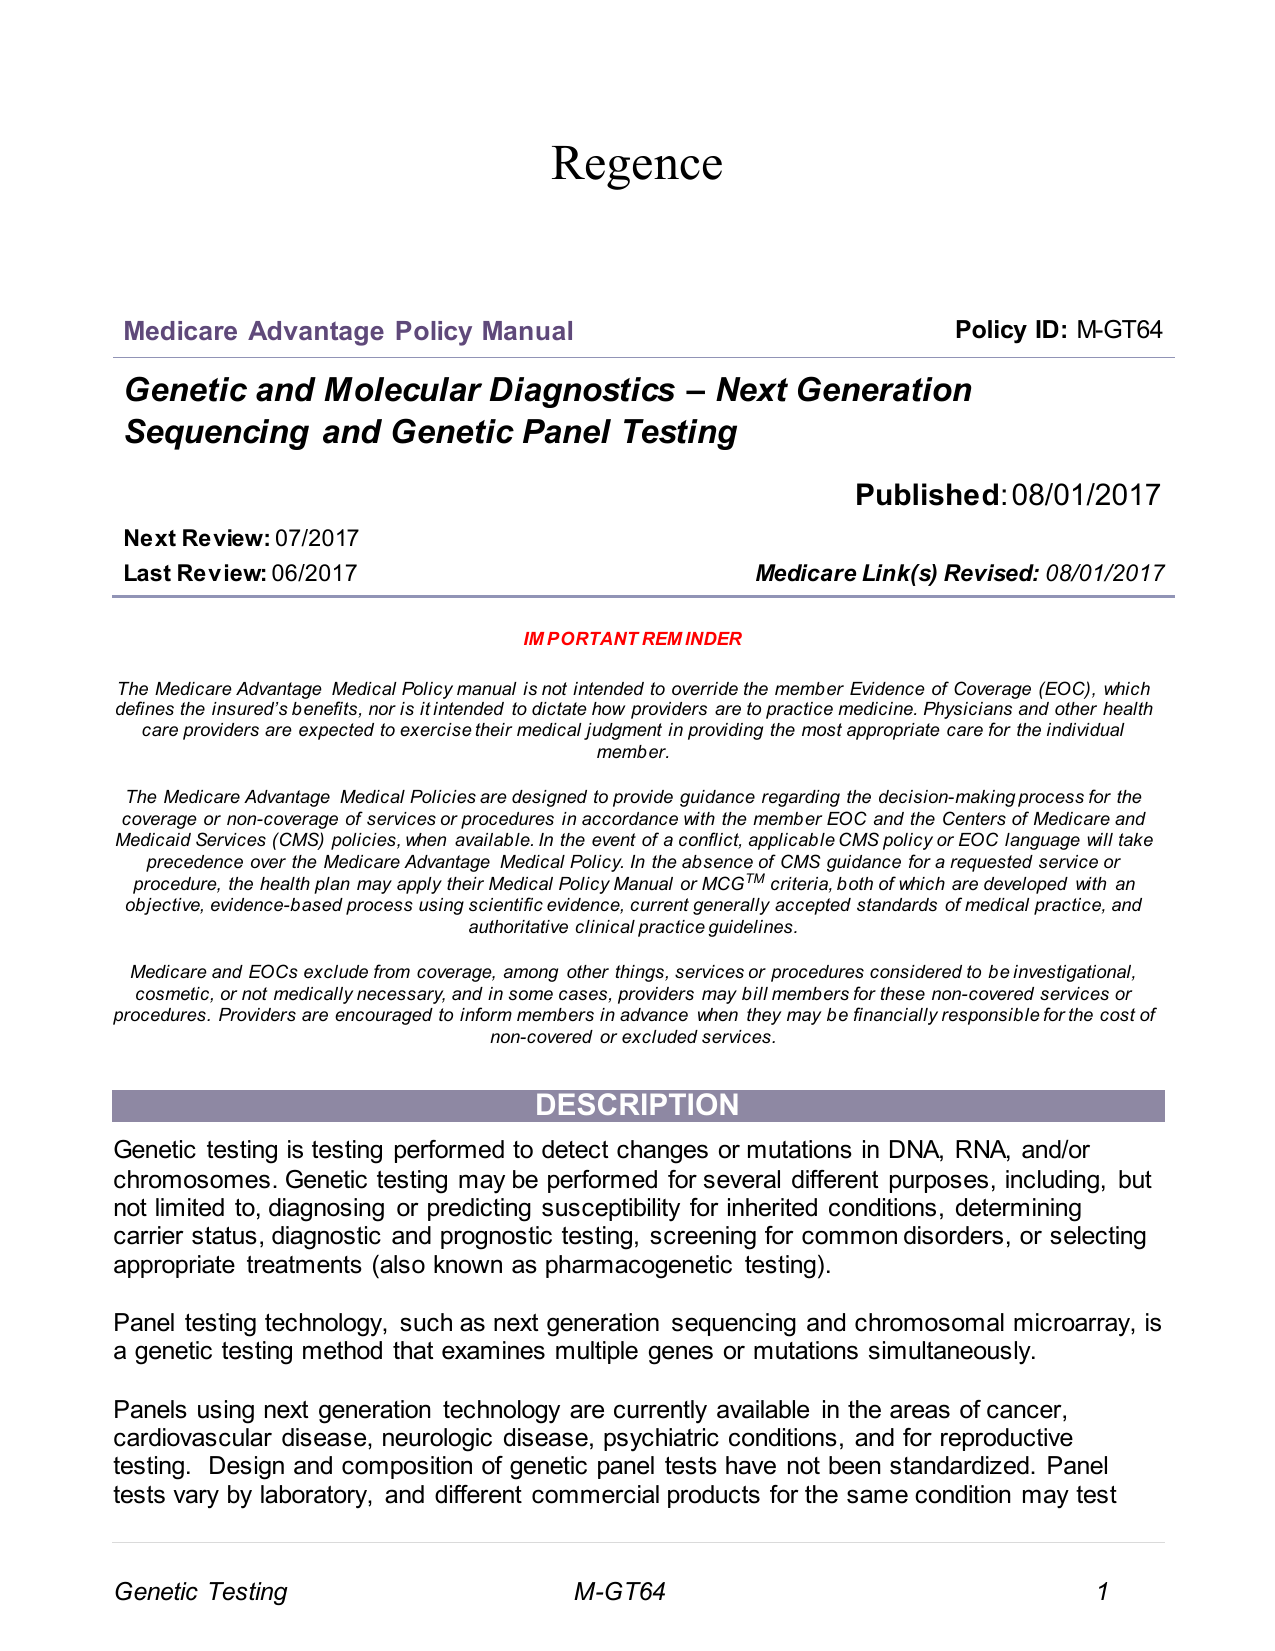 Genetic and Molecular Diagnostics – Next Generation Sequencing